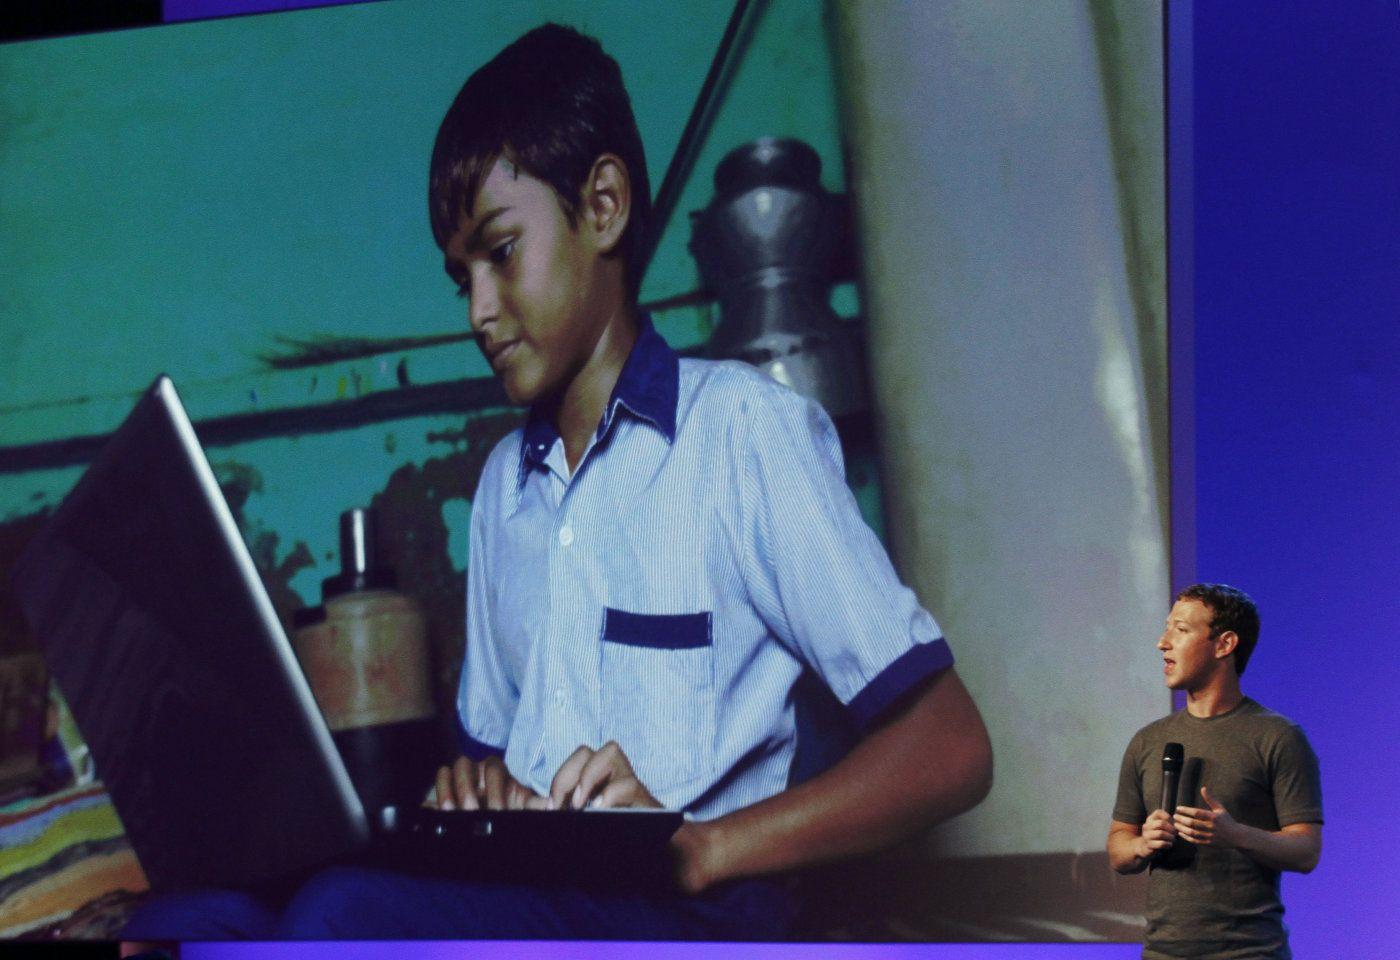 India puts the kibosh on Facebook's 'Free Basics